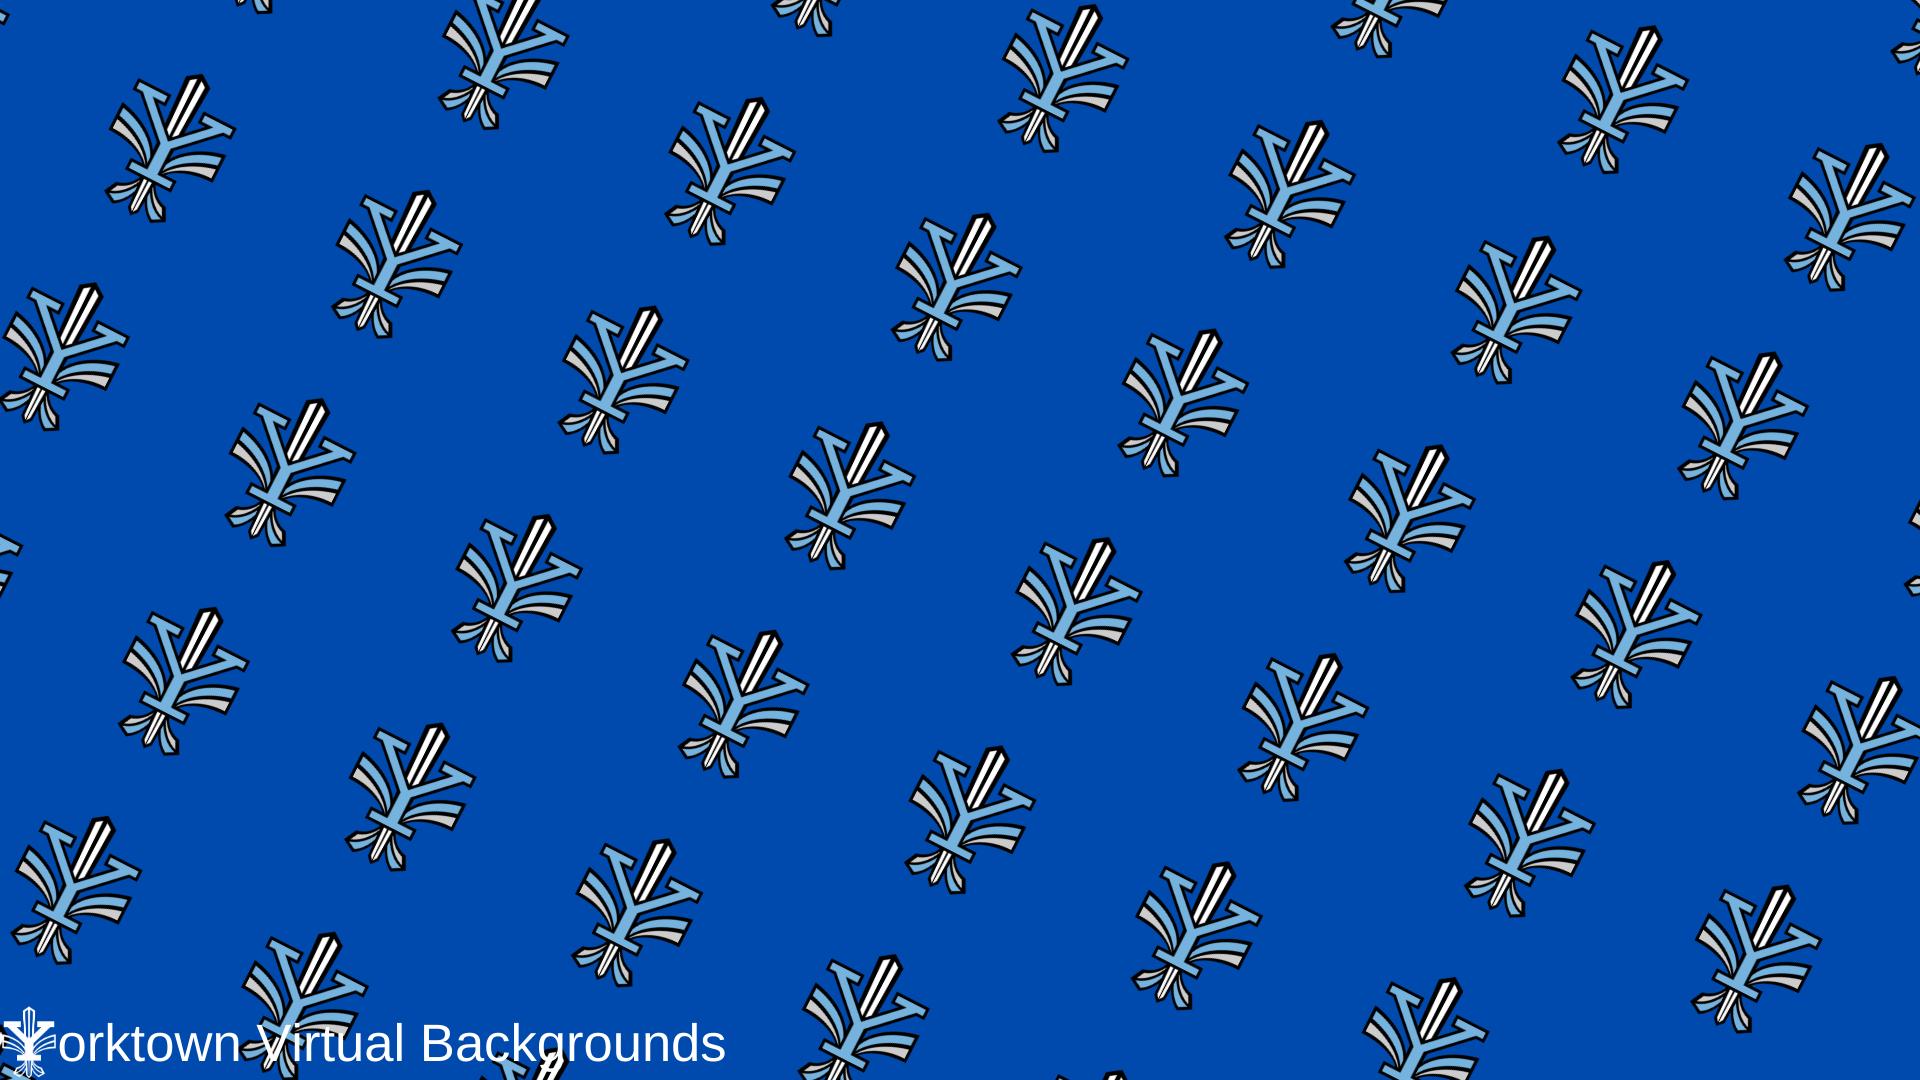 Yorktown Logo Wallpaper for Teams - Royal Blue - Diagonal